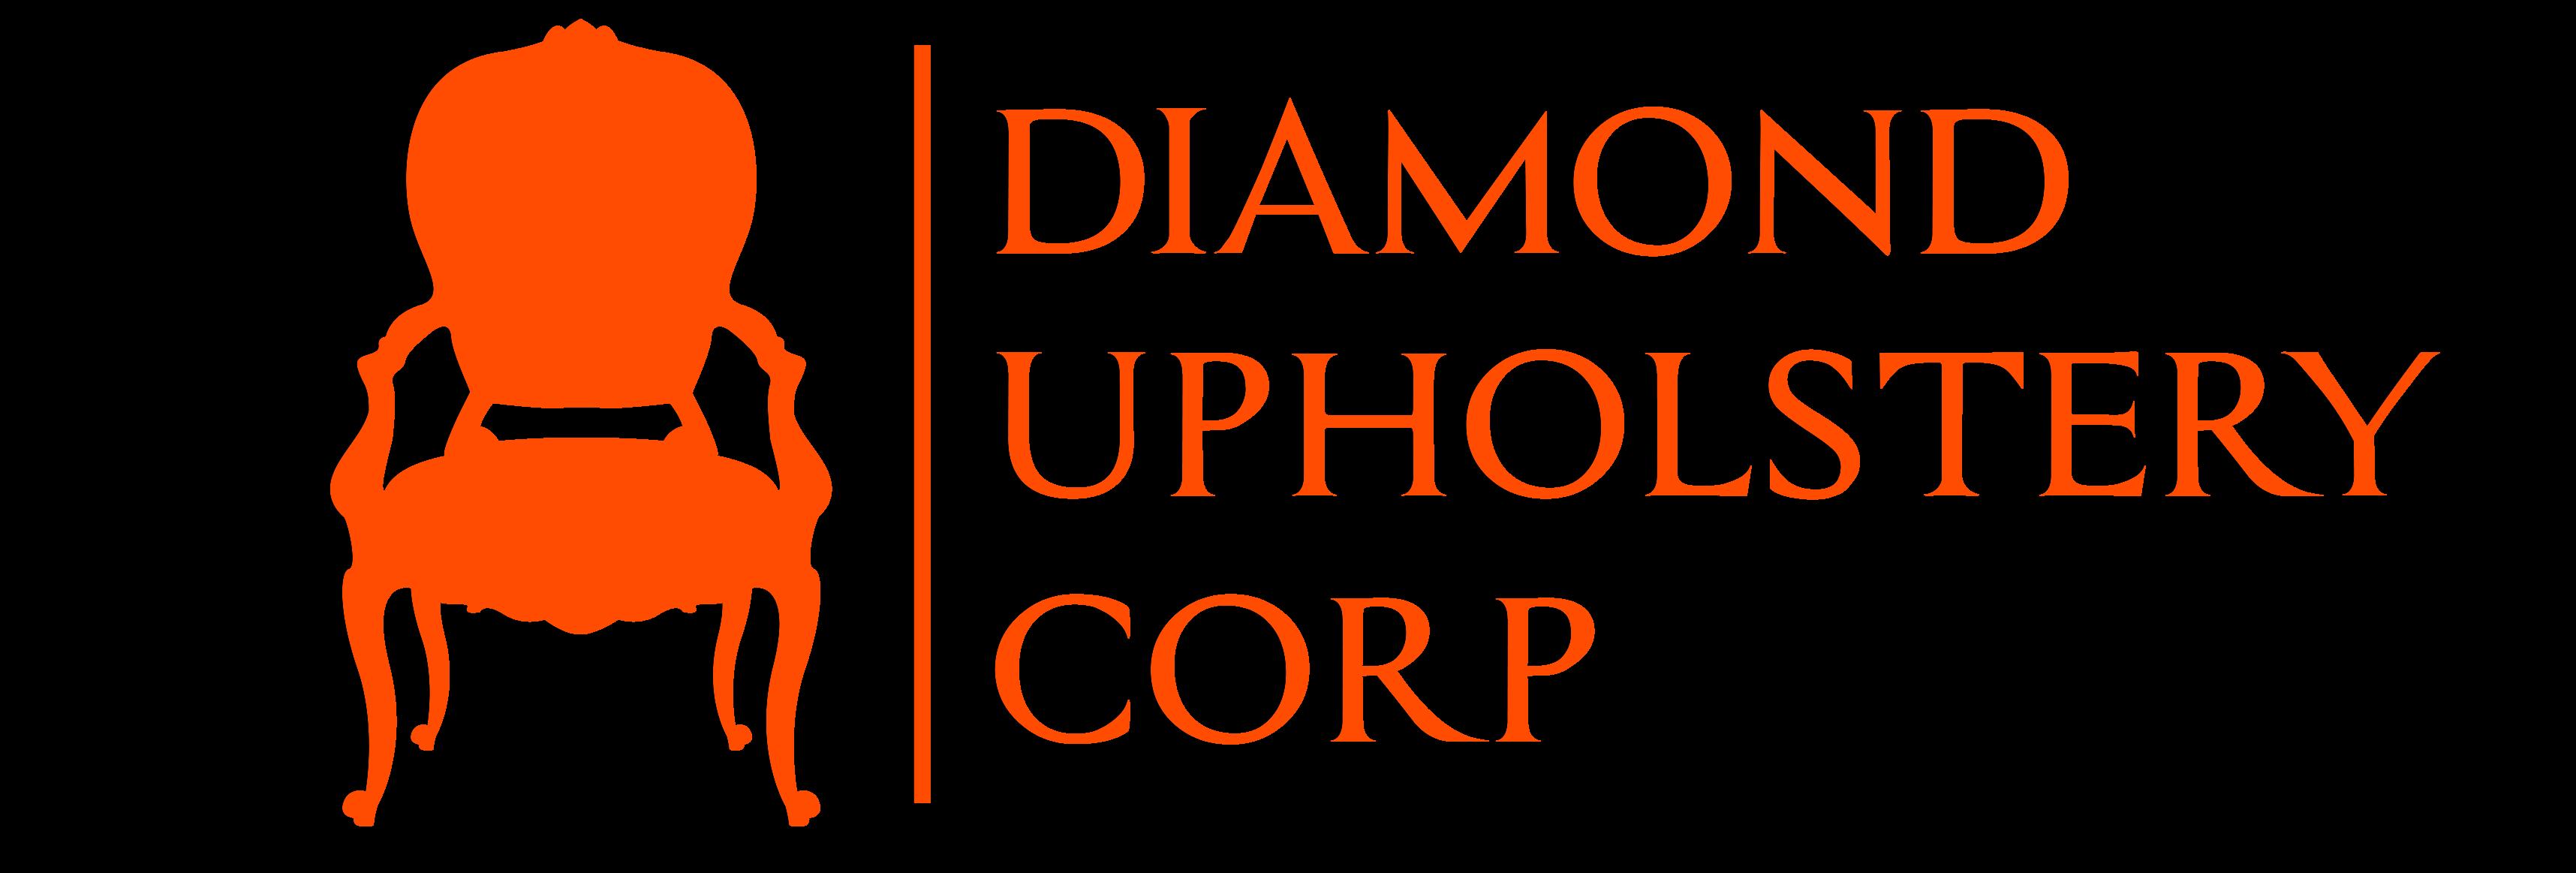 Diamond Upholstery